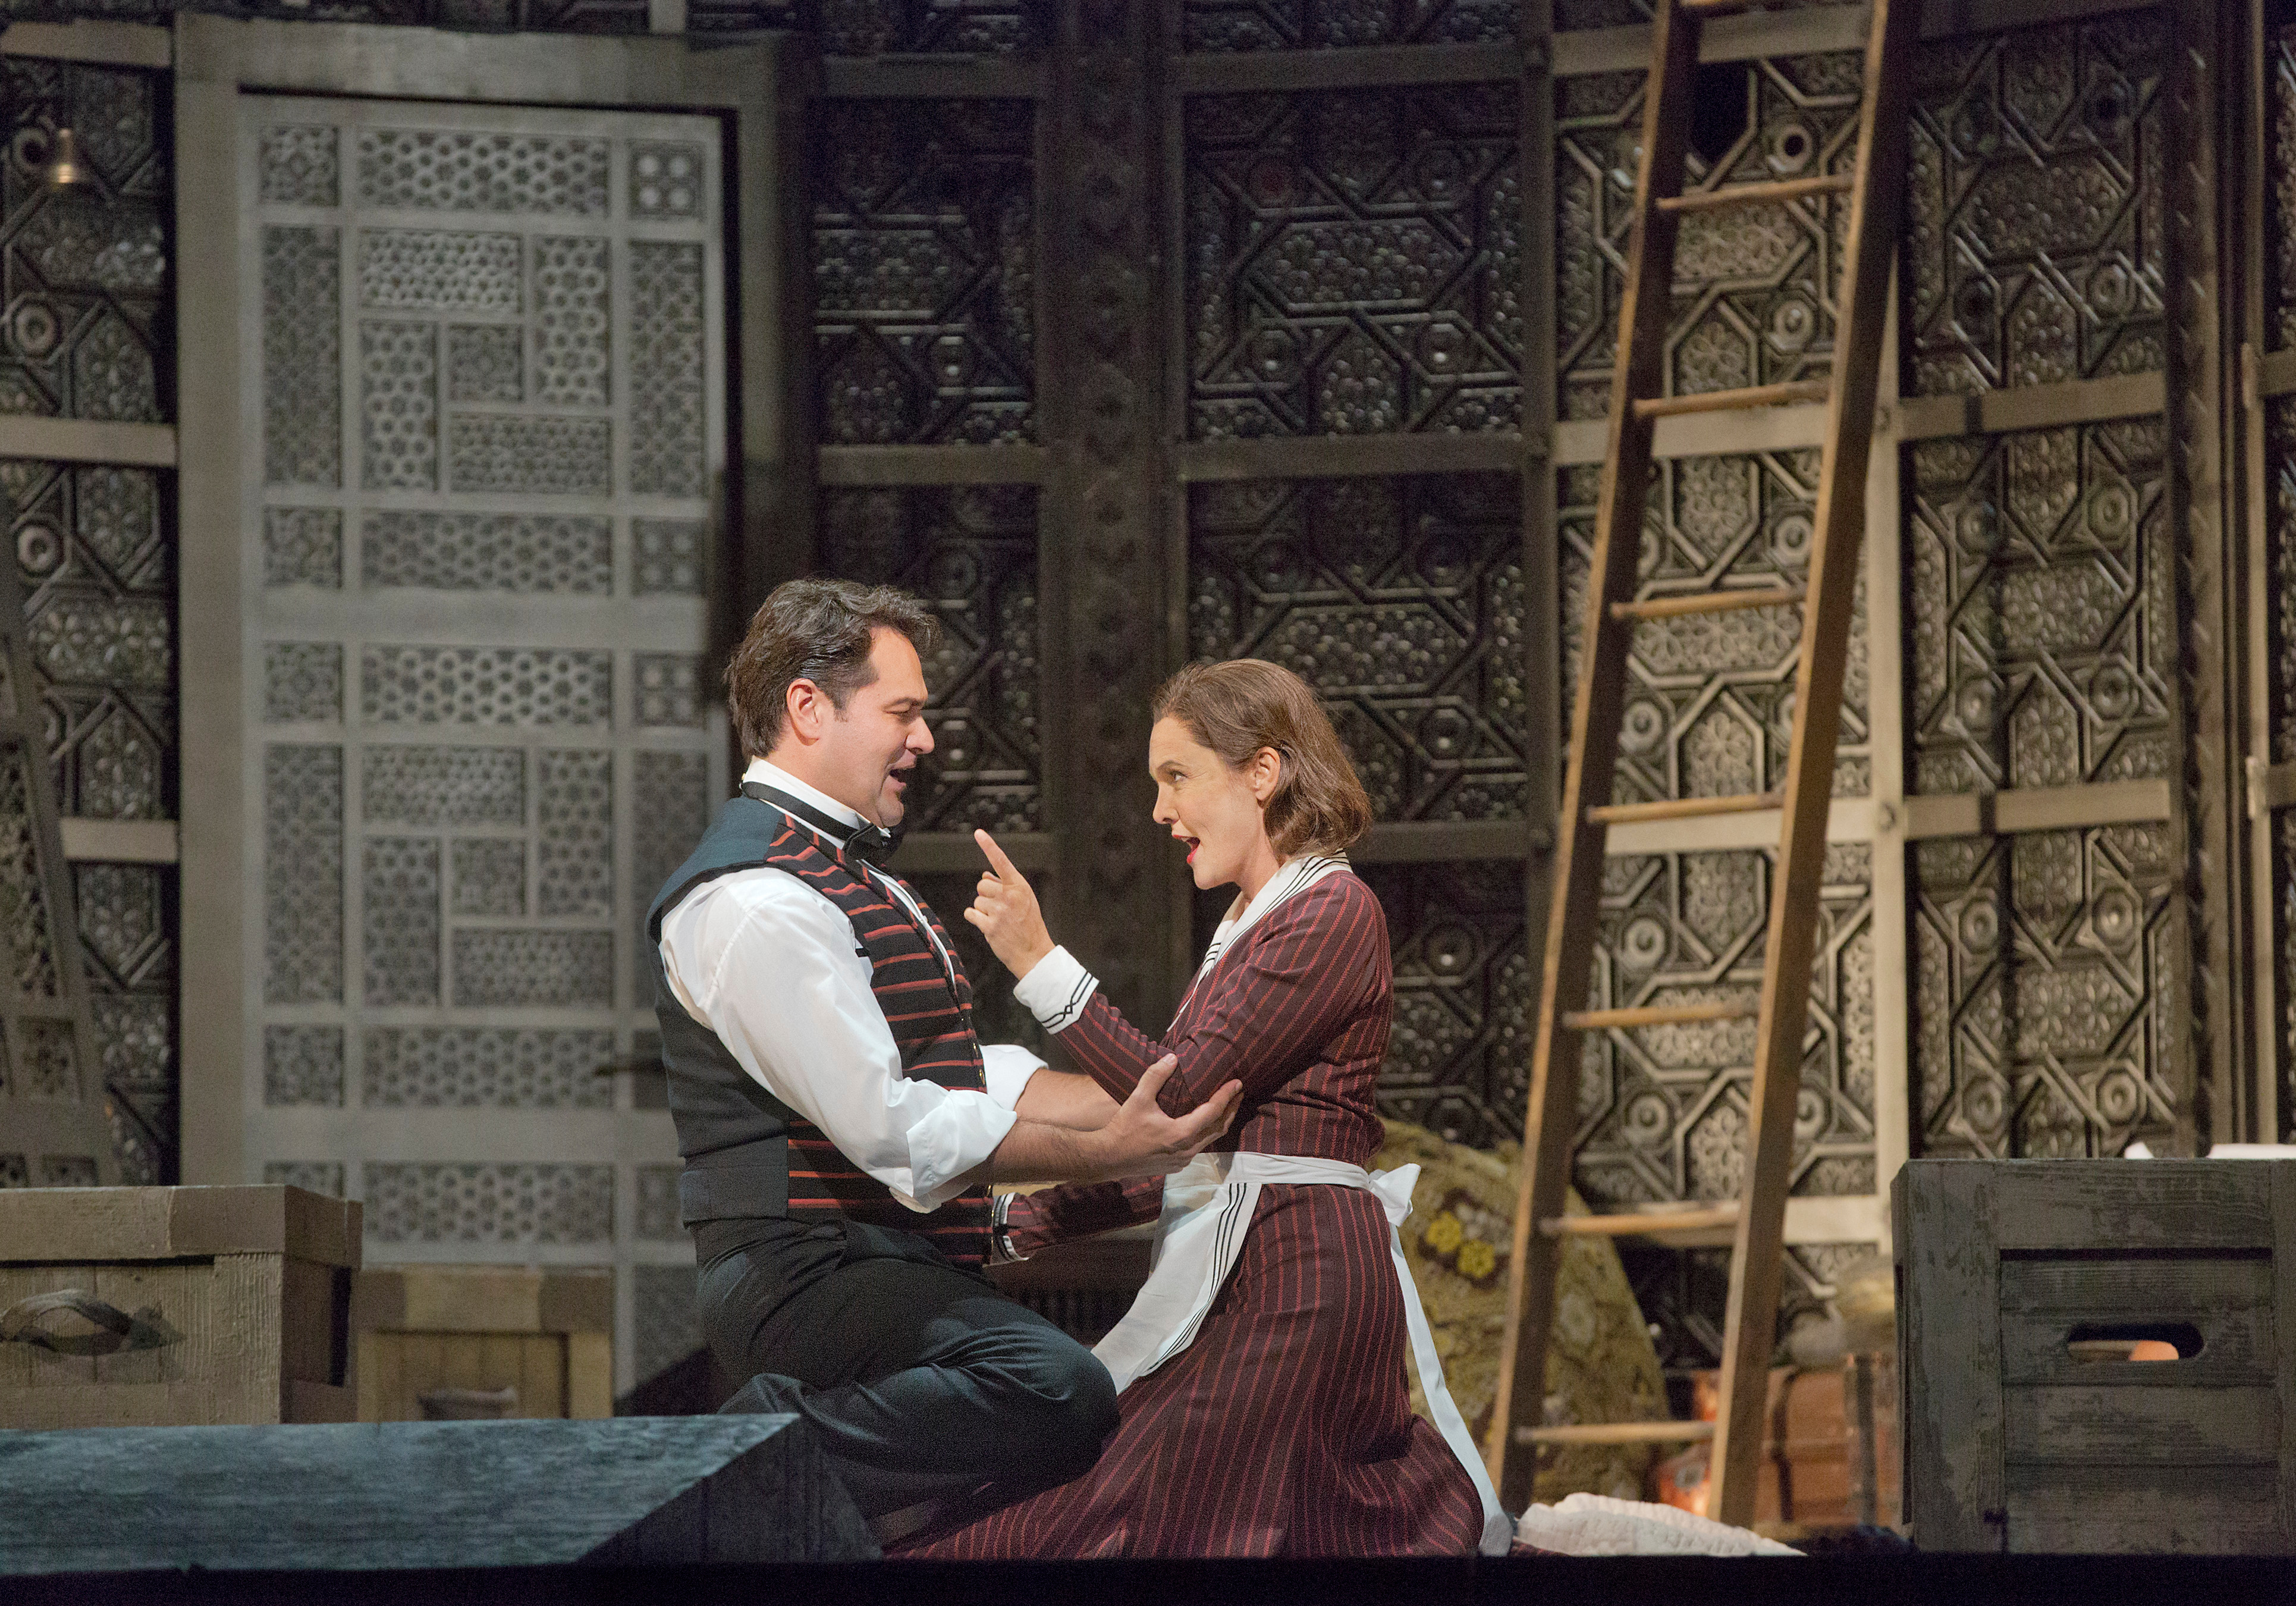 Metropolitan Opera Review 2014-15 - Le Nozze Di Figaro: A Nuanced